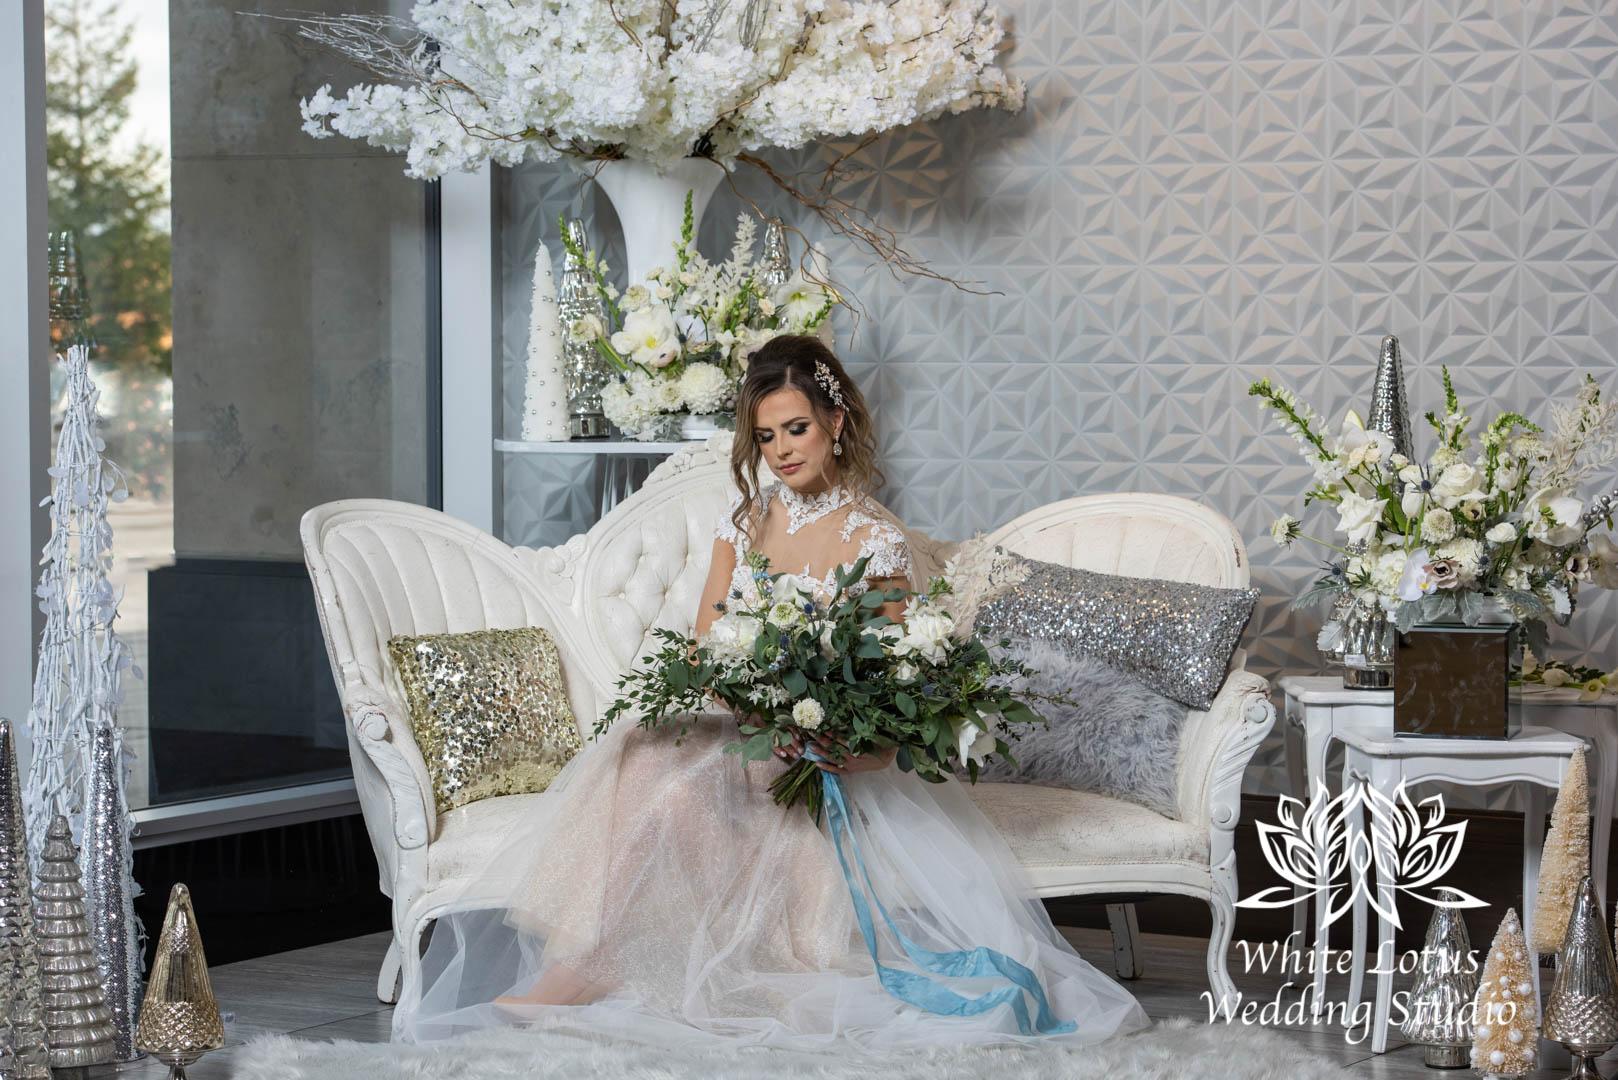 068- GLAM WINTERLUXE WEDDING INSPIRATION